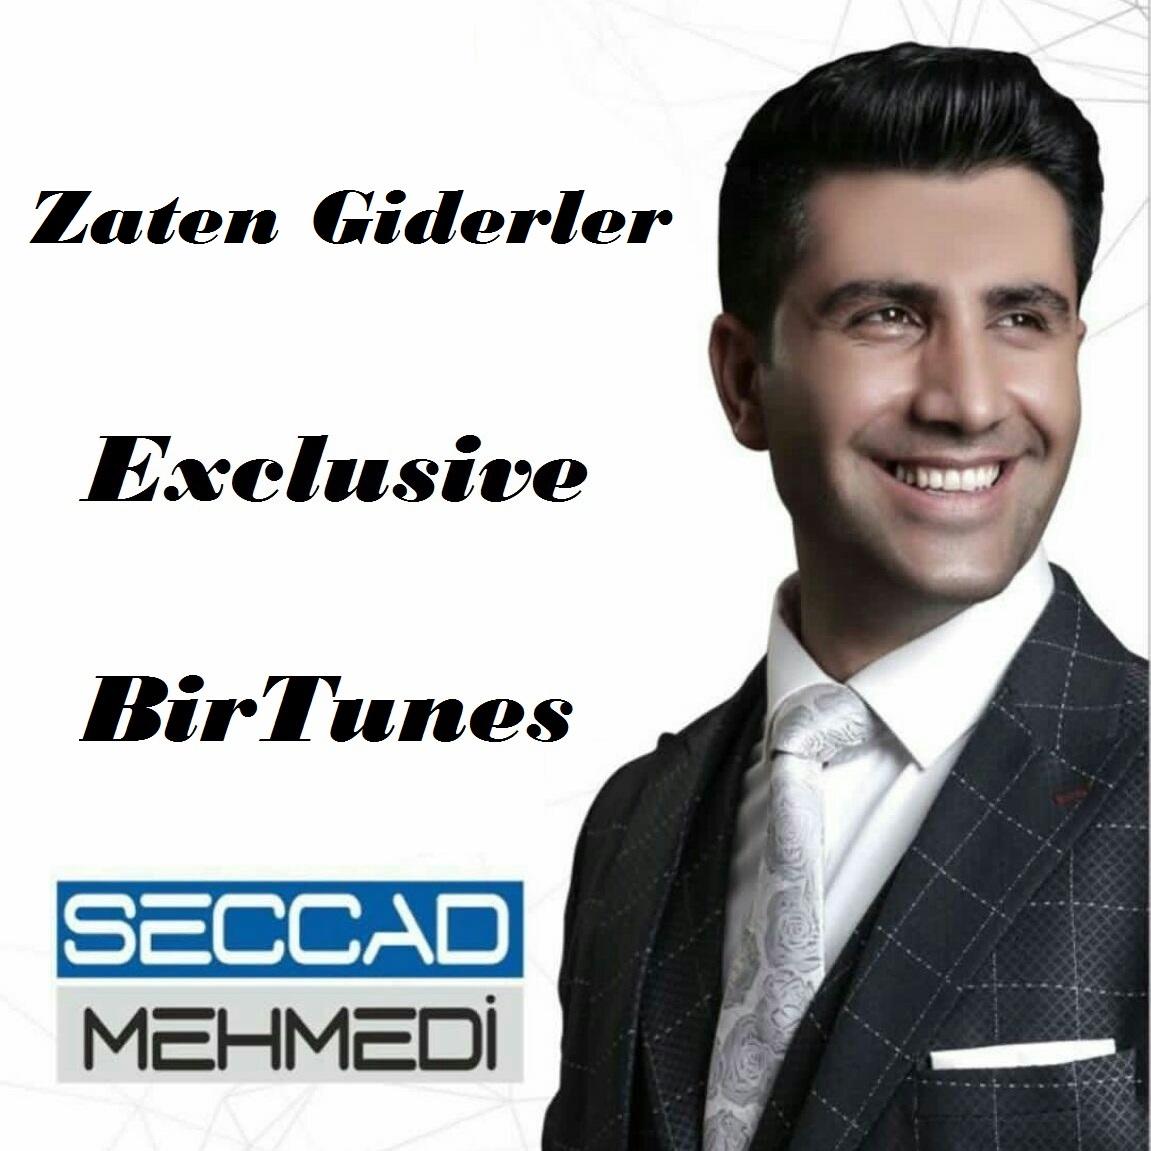 http://birtunes.ir/wp-content/uploads/2018/11/Seccad-Mehmedi-Gunel-Zaten-Giderler.jpeg